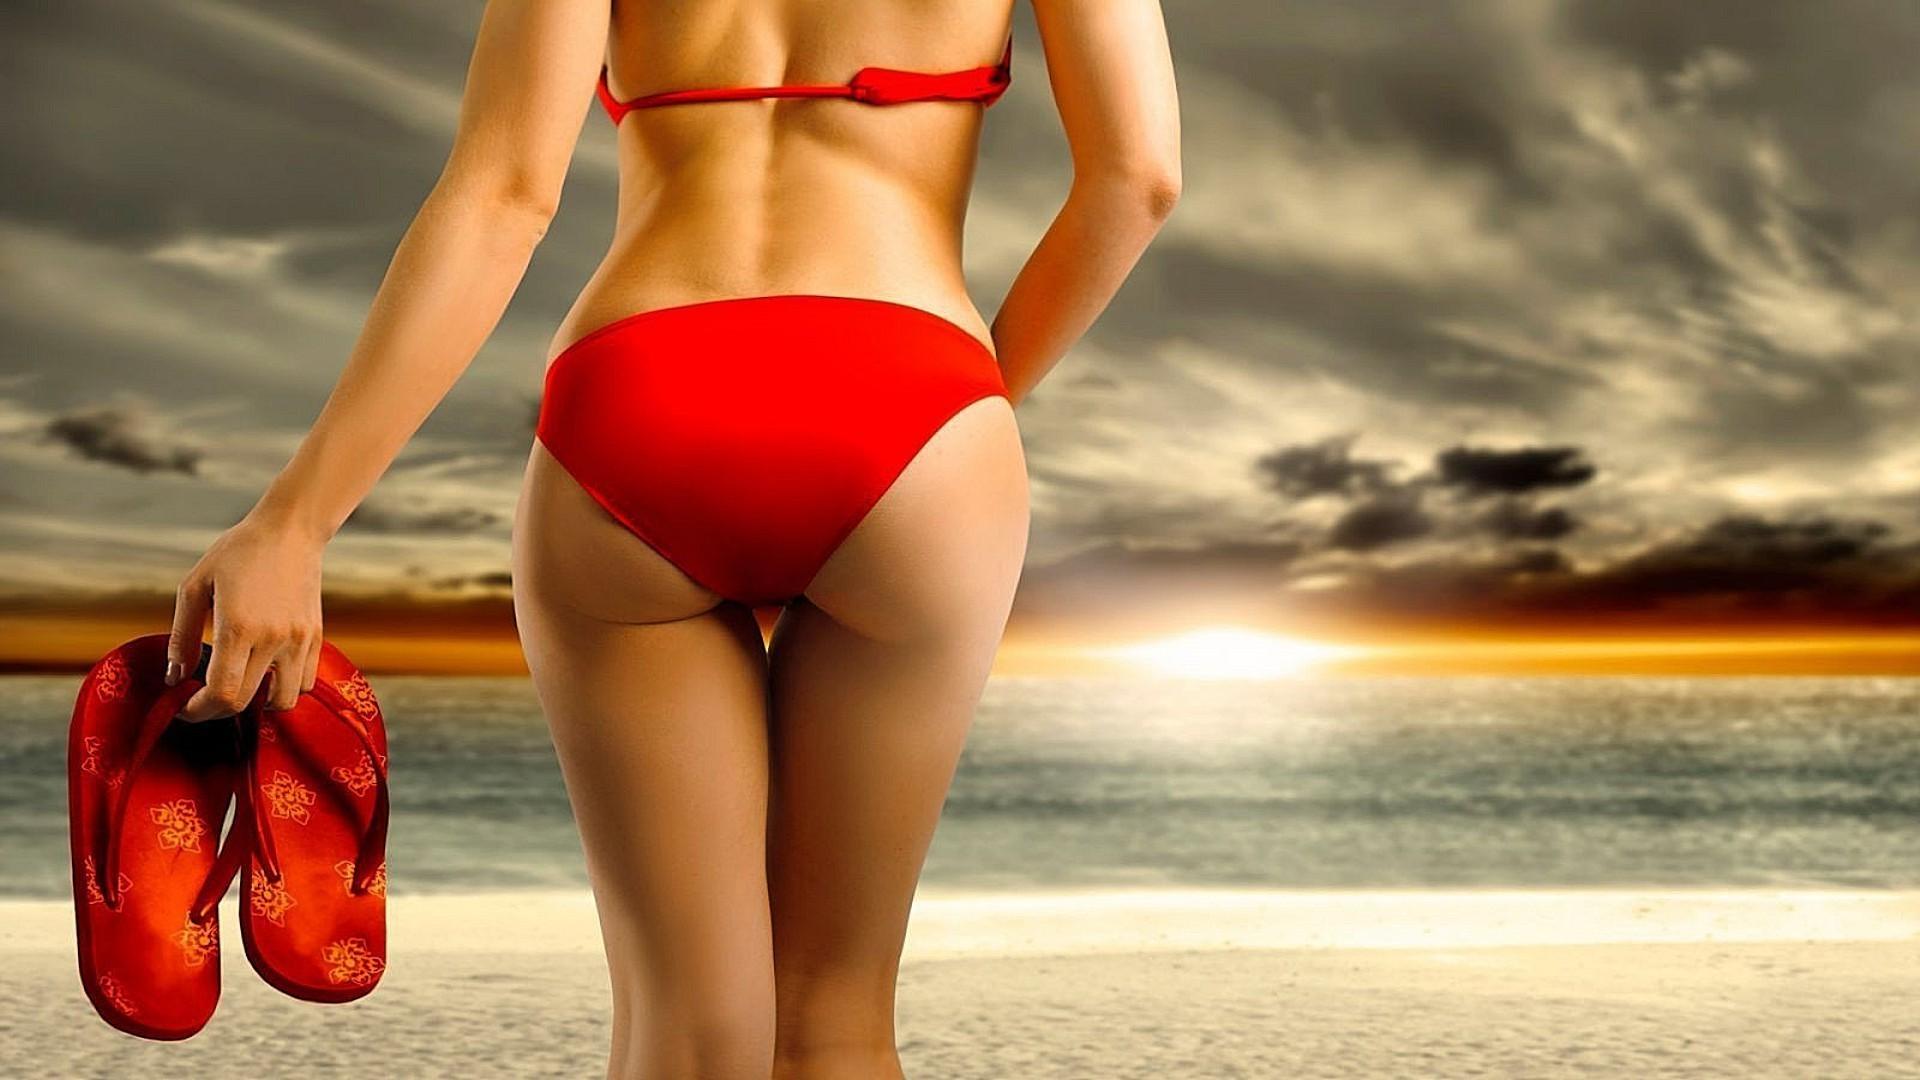 Красная задница фото, грубое порно фото видео